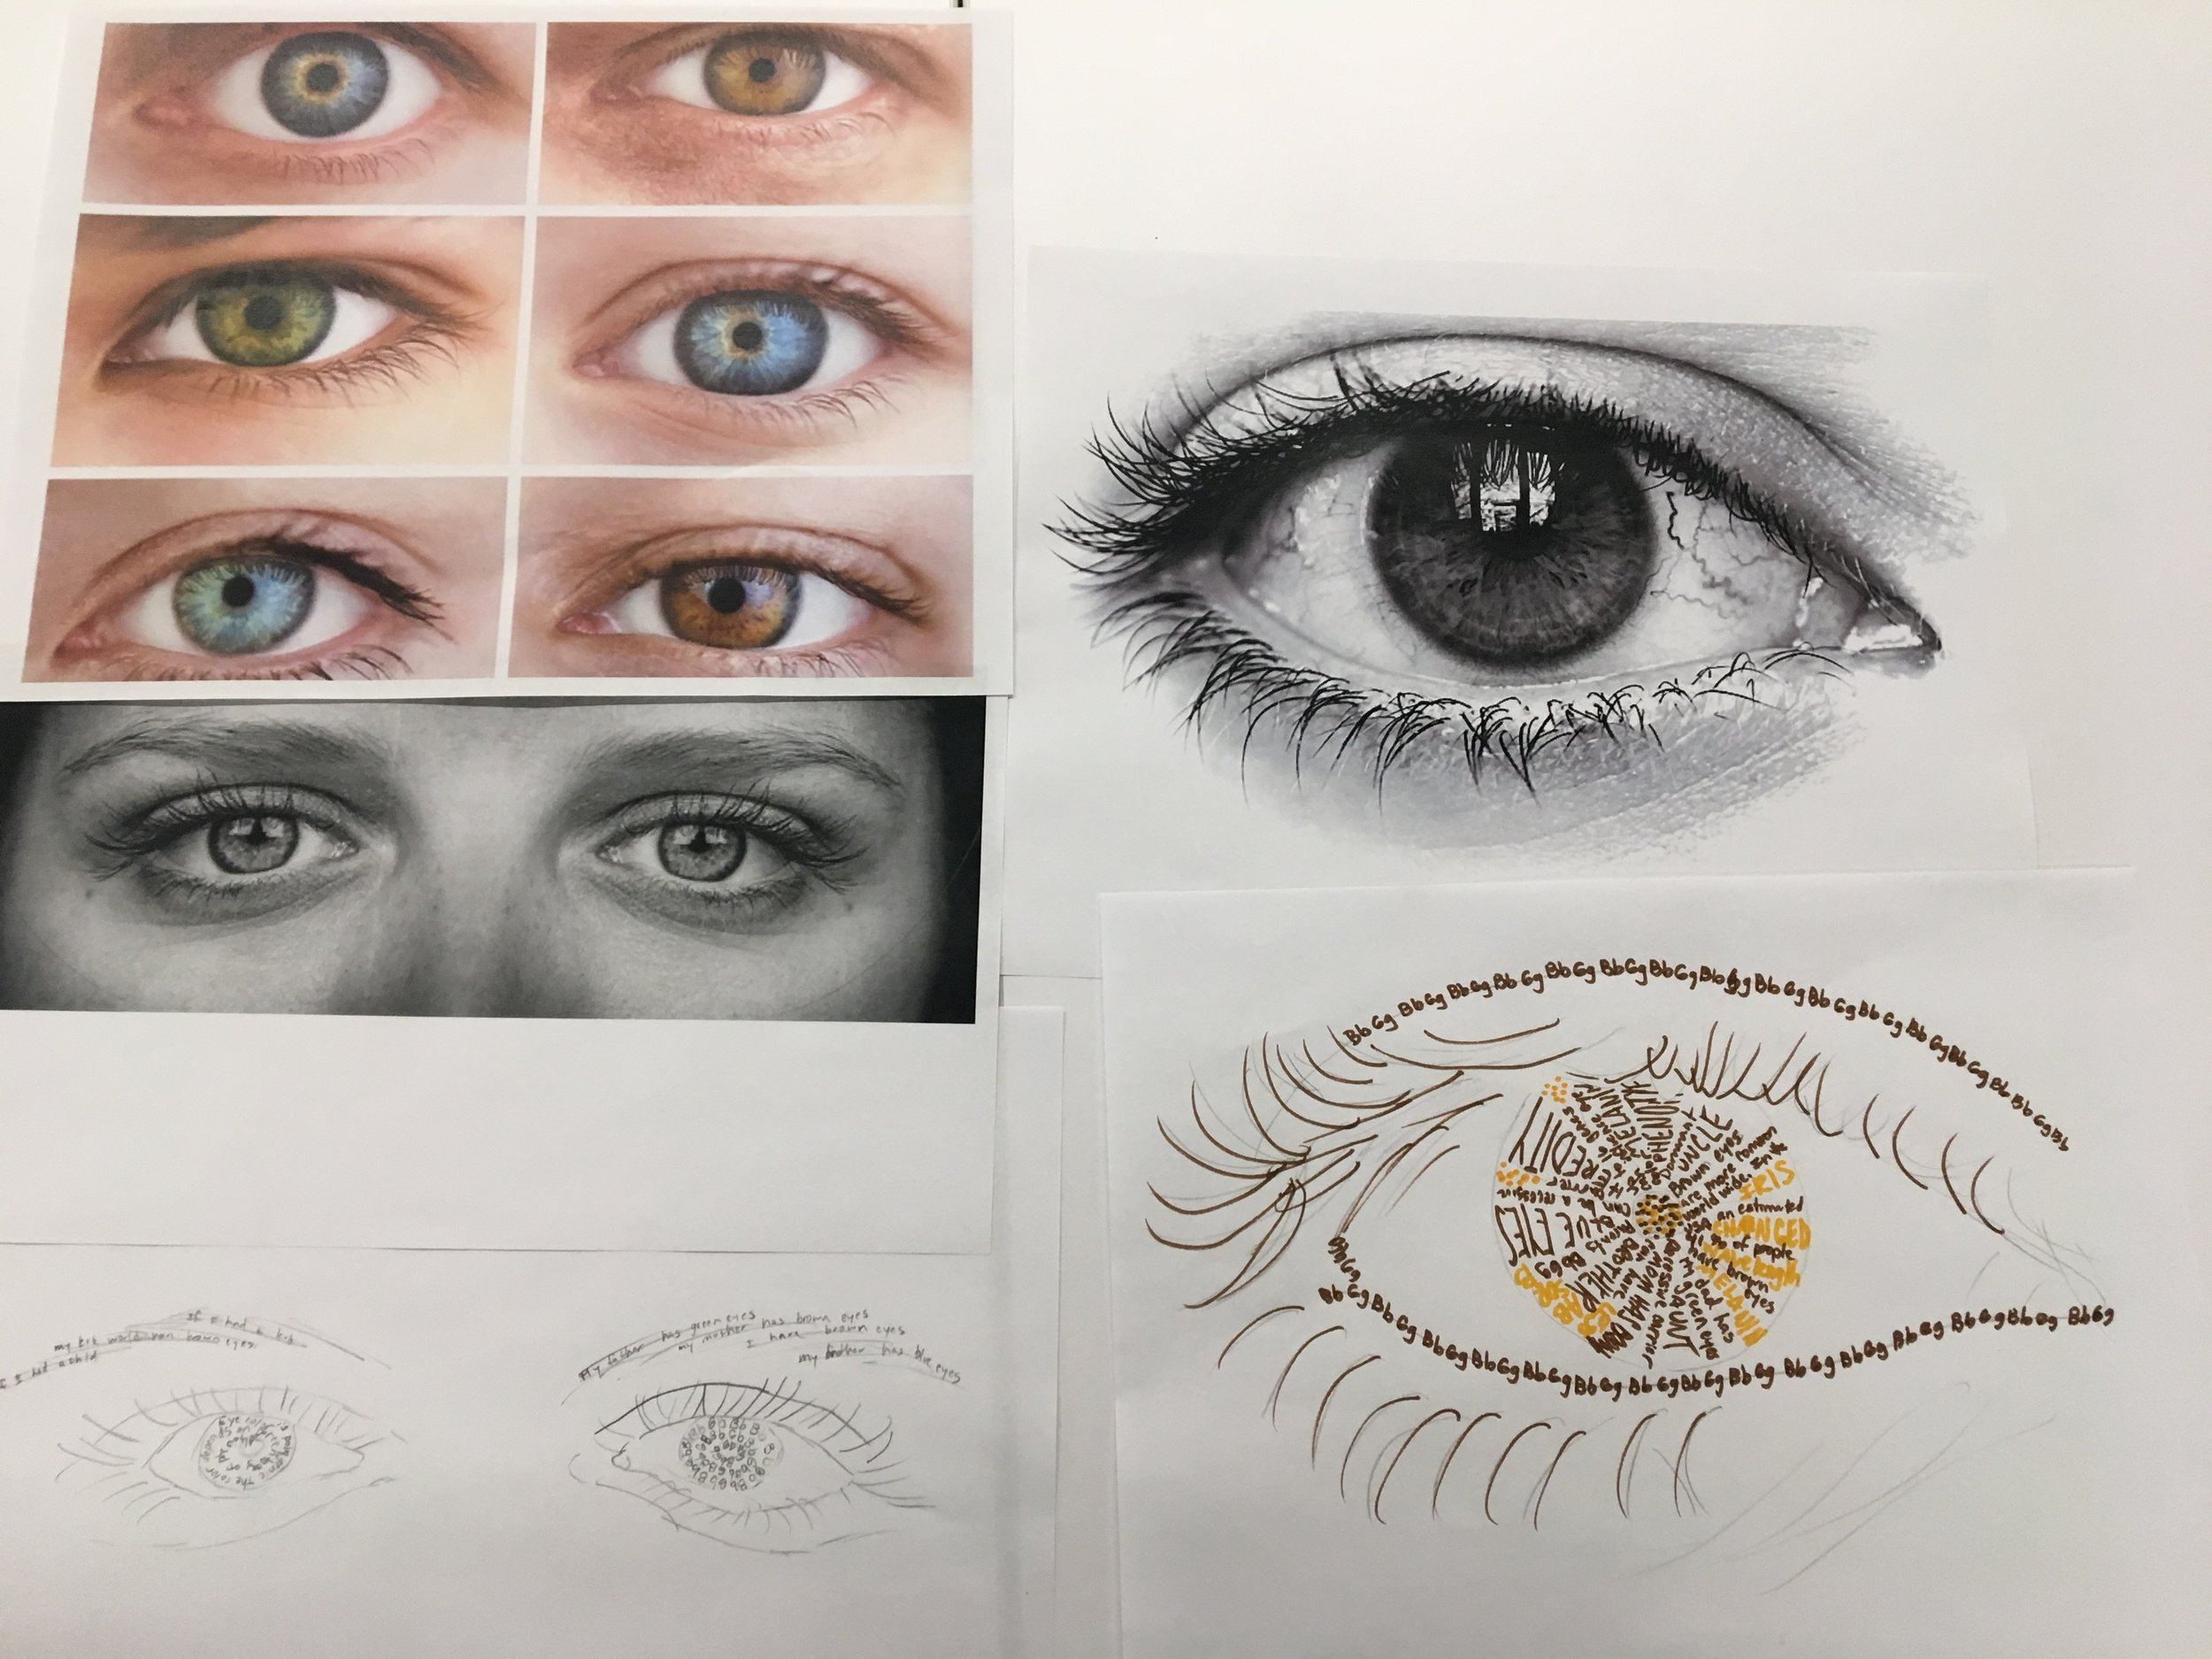 Genetics TYPOGRAPHY Art, STEAM class